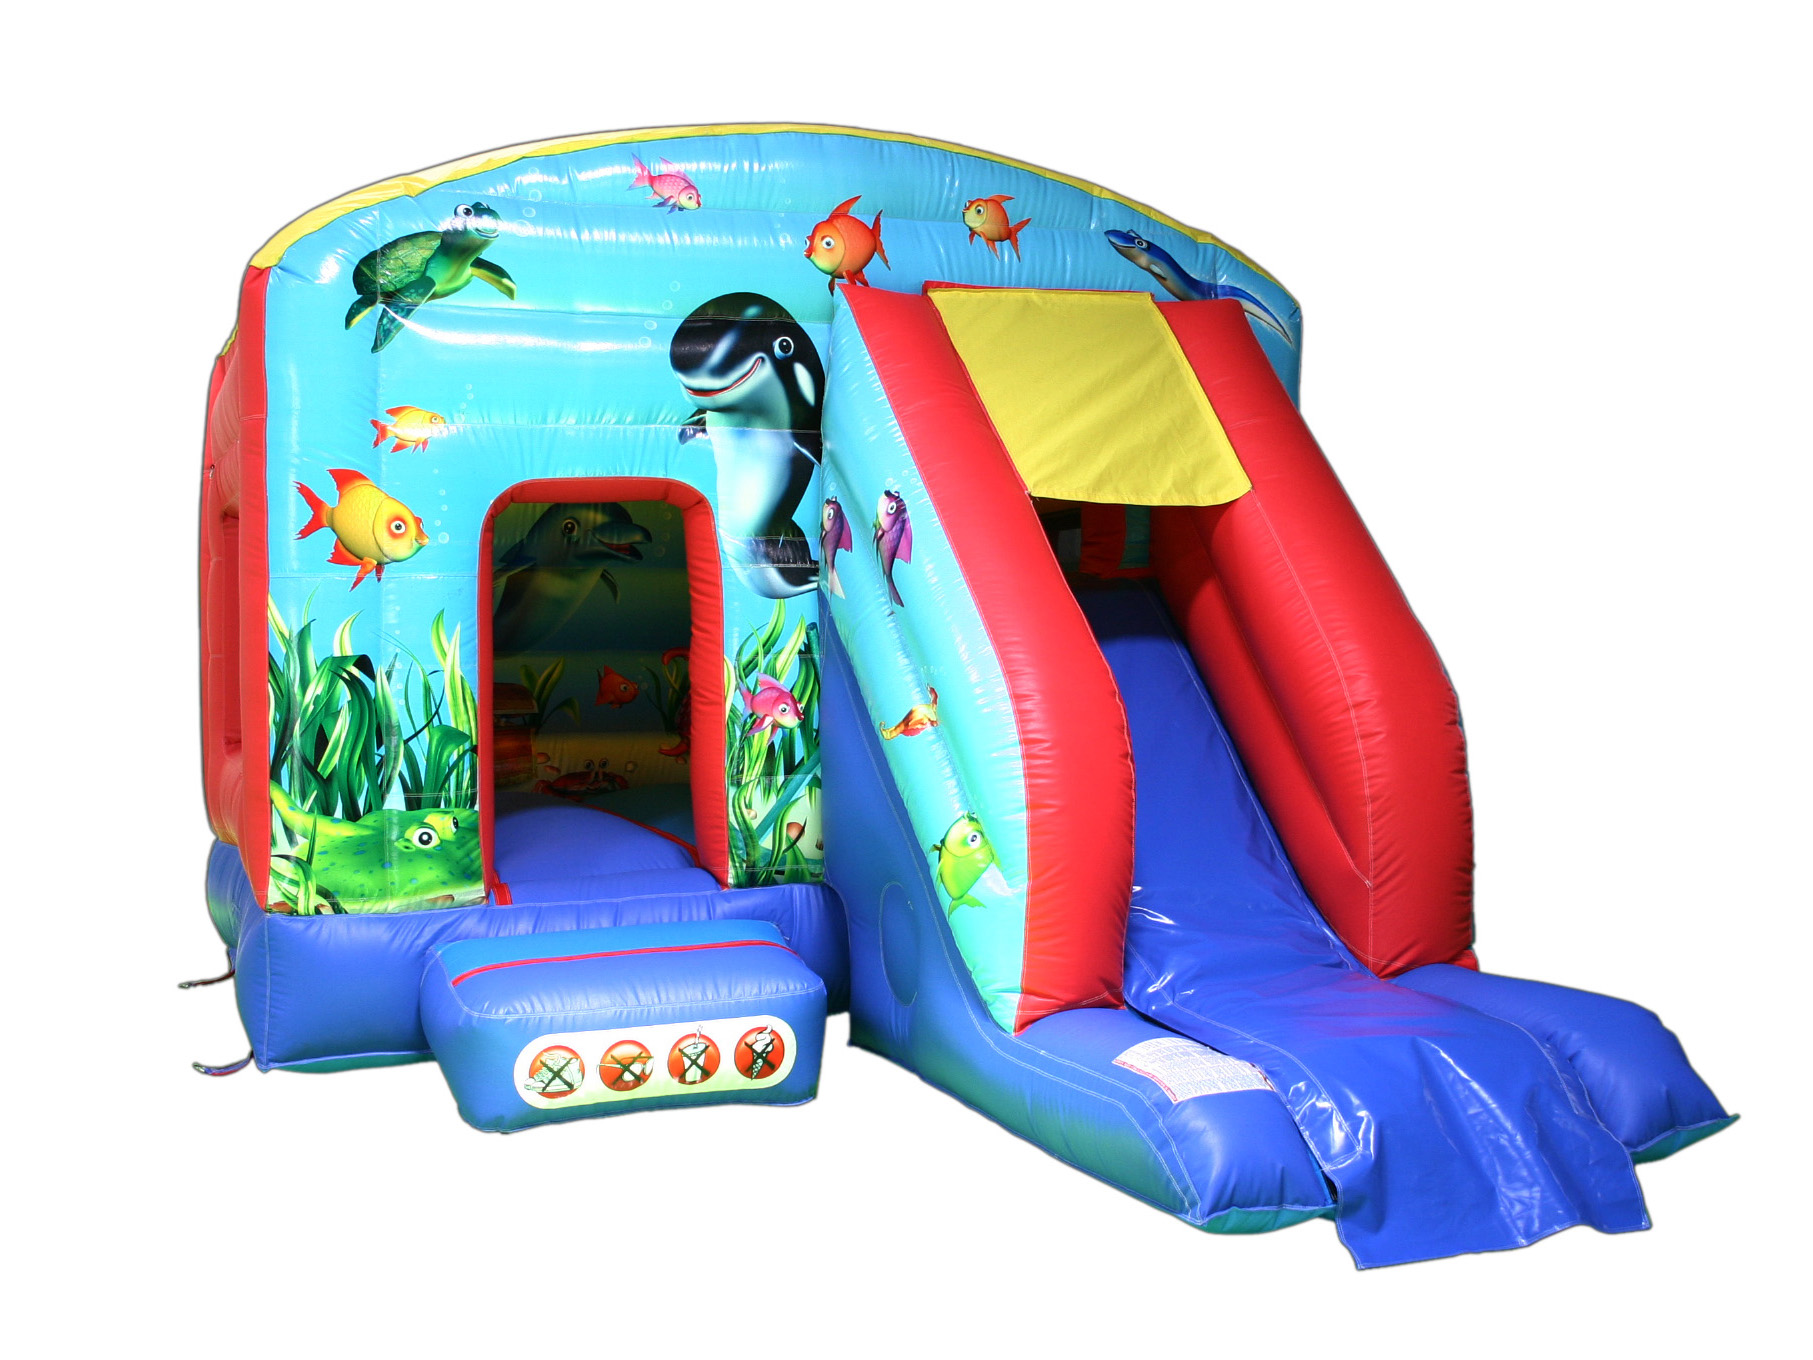 12x15 bounce & slides